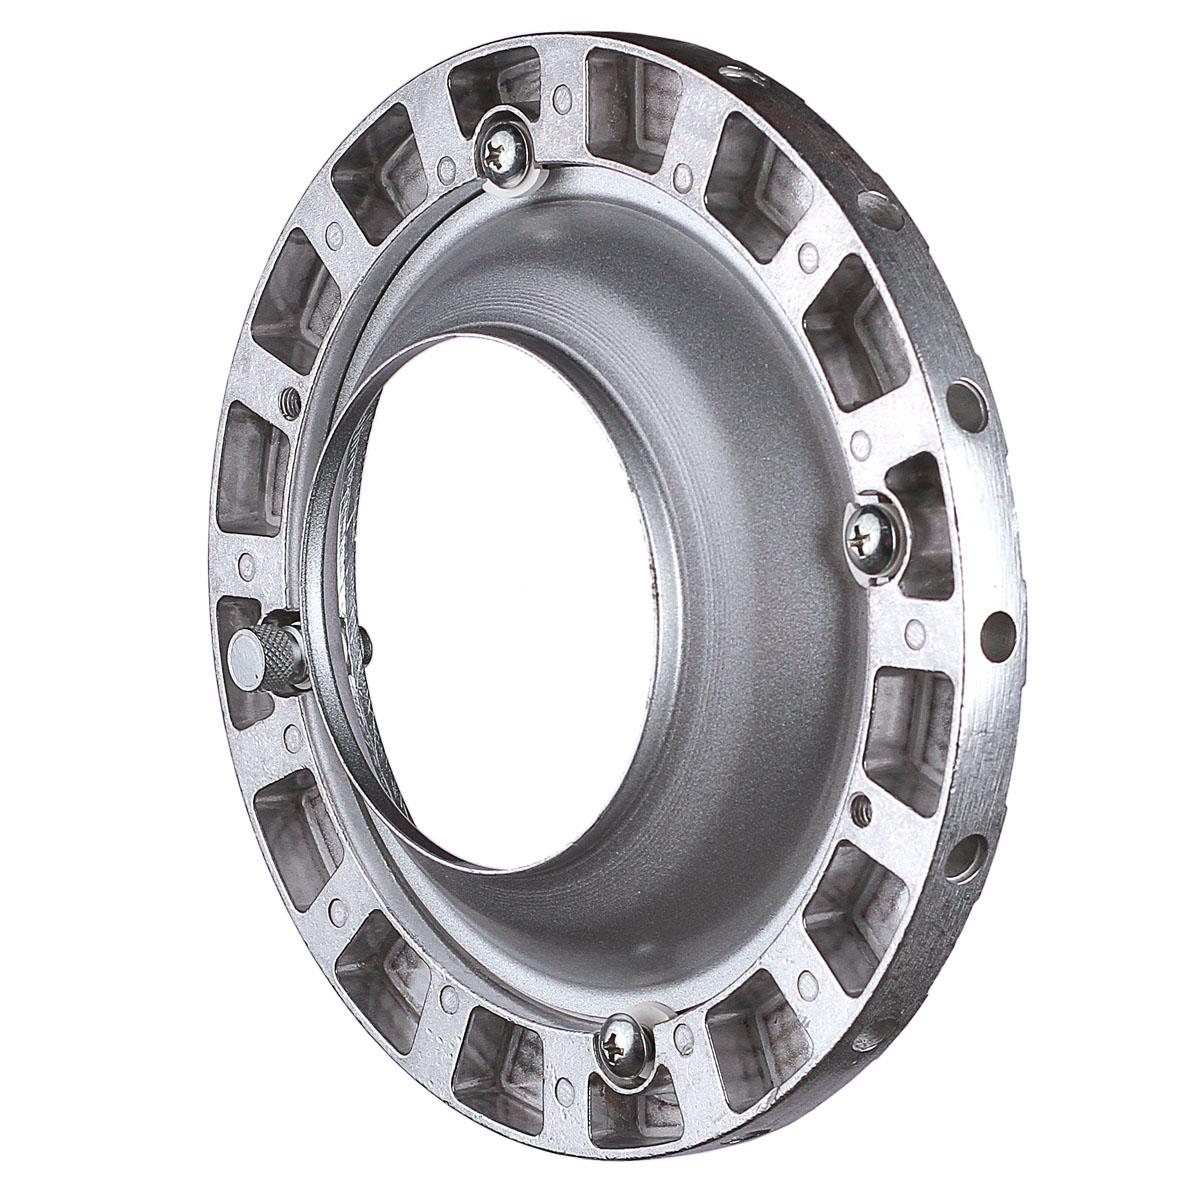 Phottix Speed Ring For Balcar (144mm, 16-Hole)